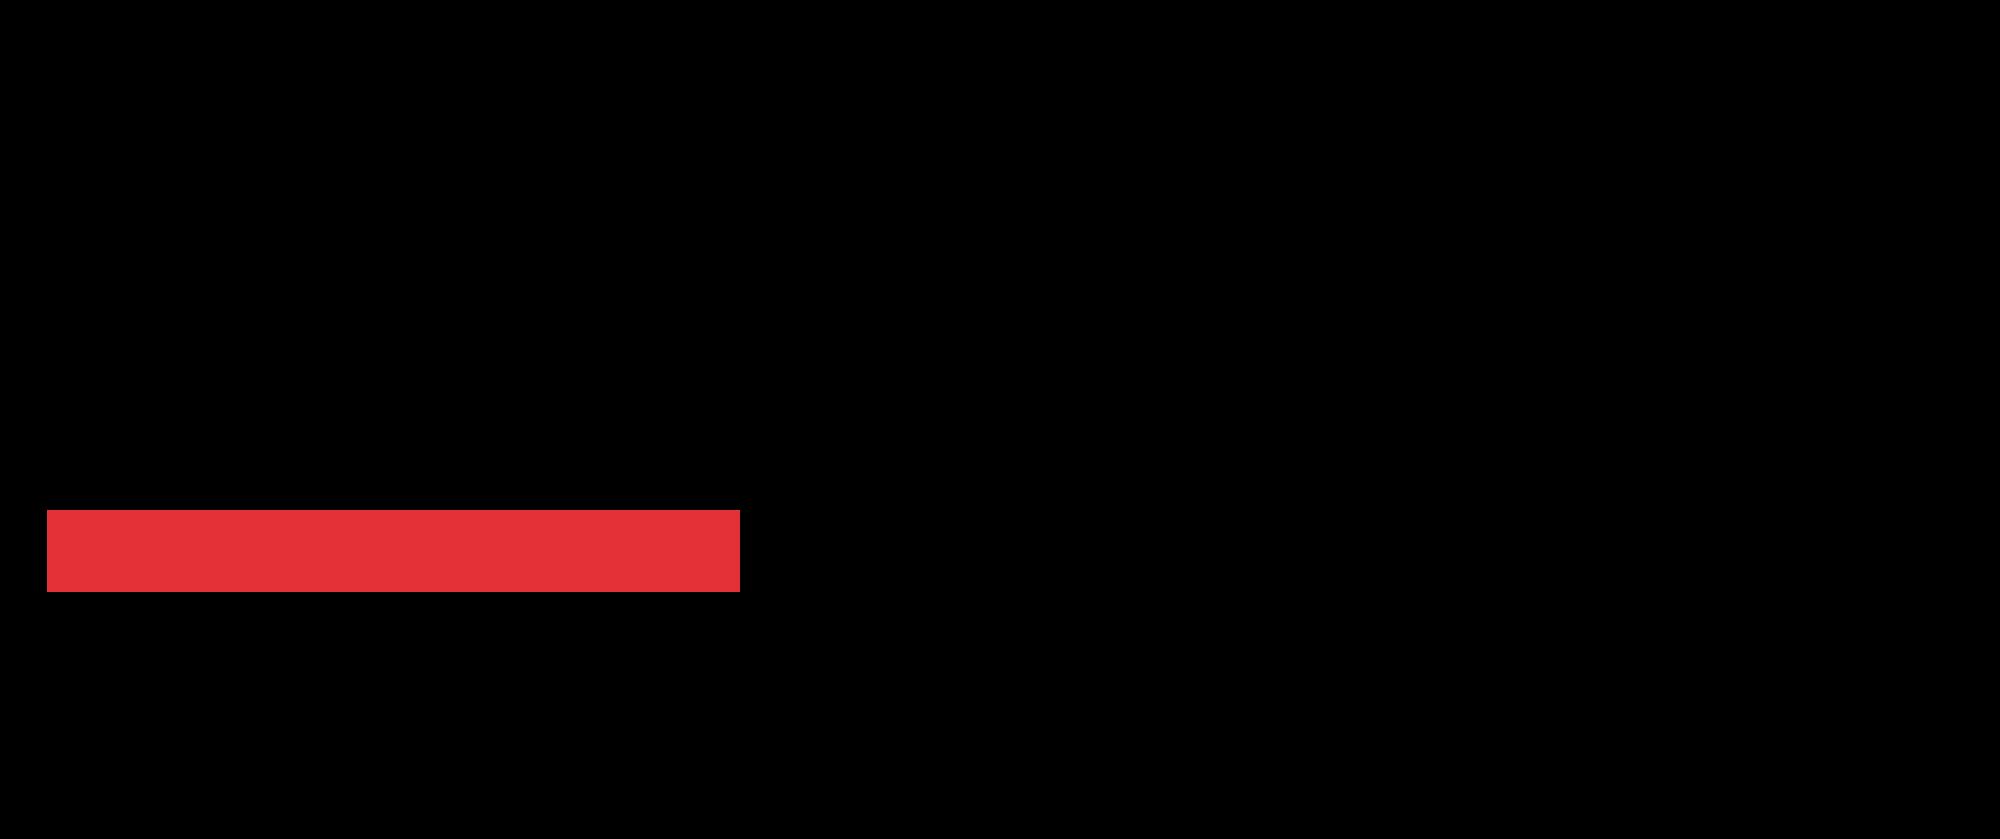 Logo des Unternehmens Lanxess